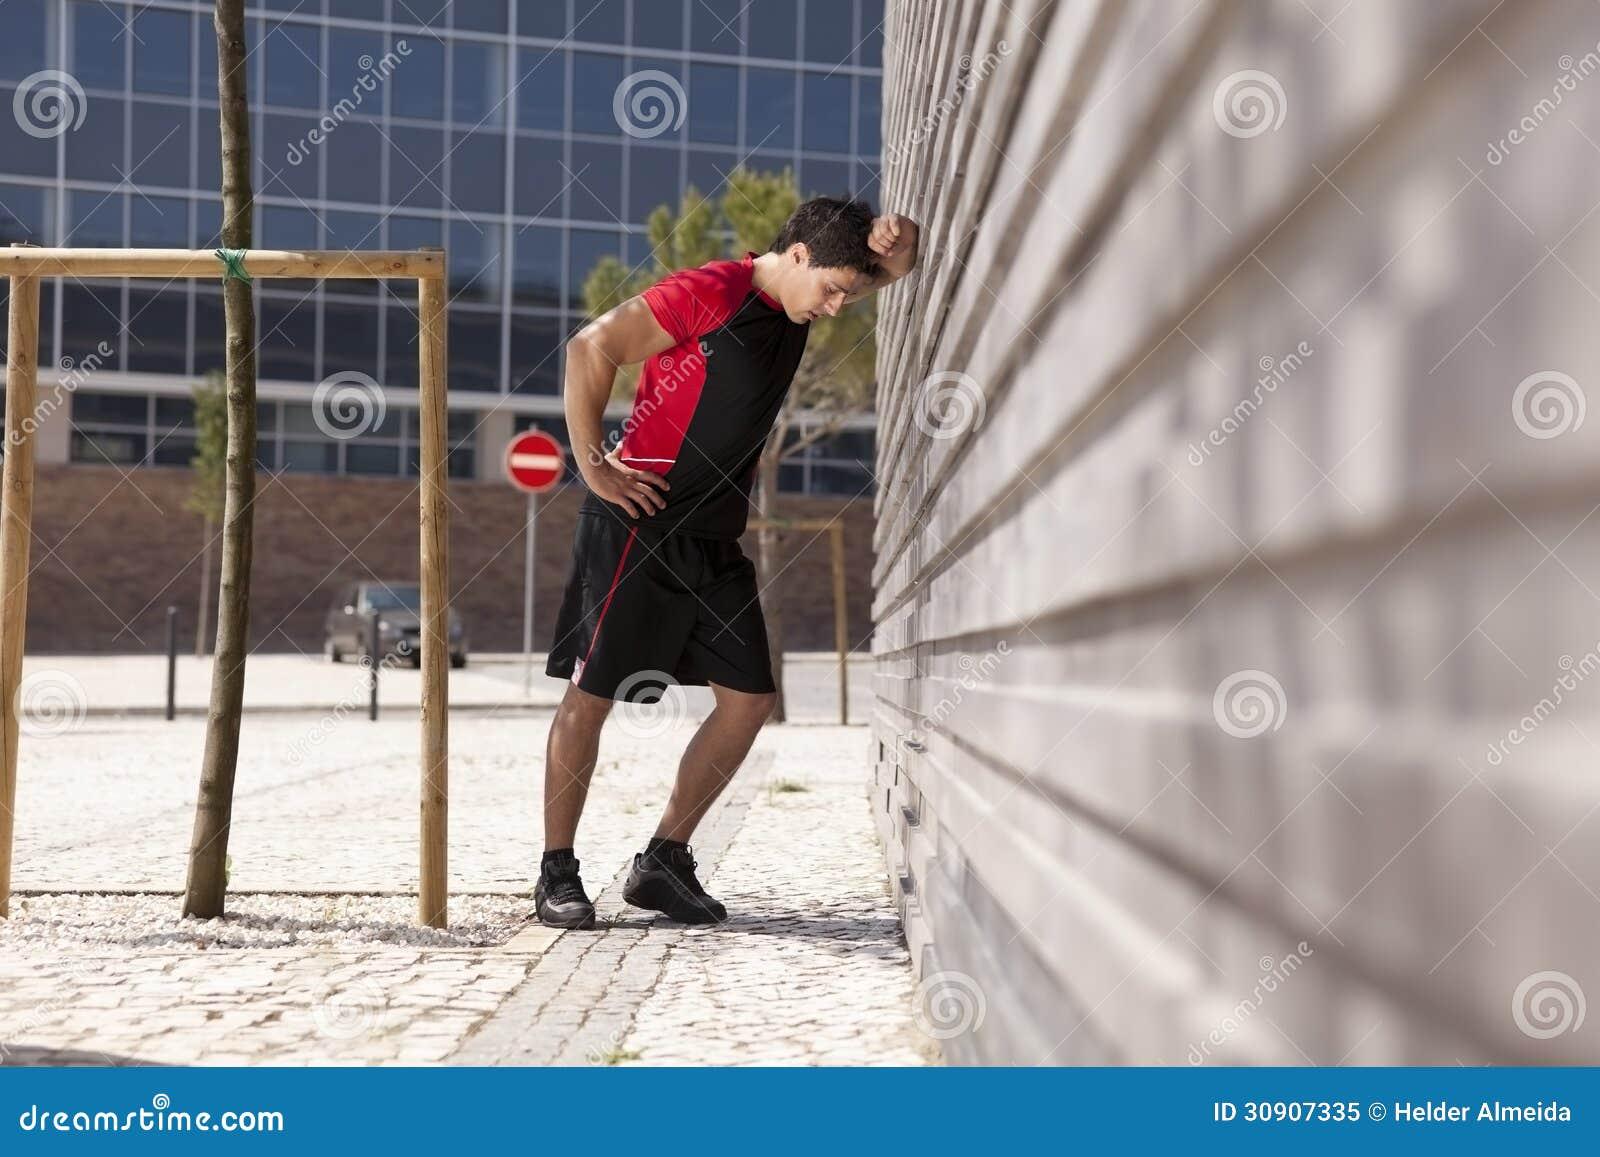 Athlete Man Tired Royalty Free Stock Photo Image 30907335